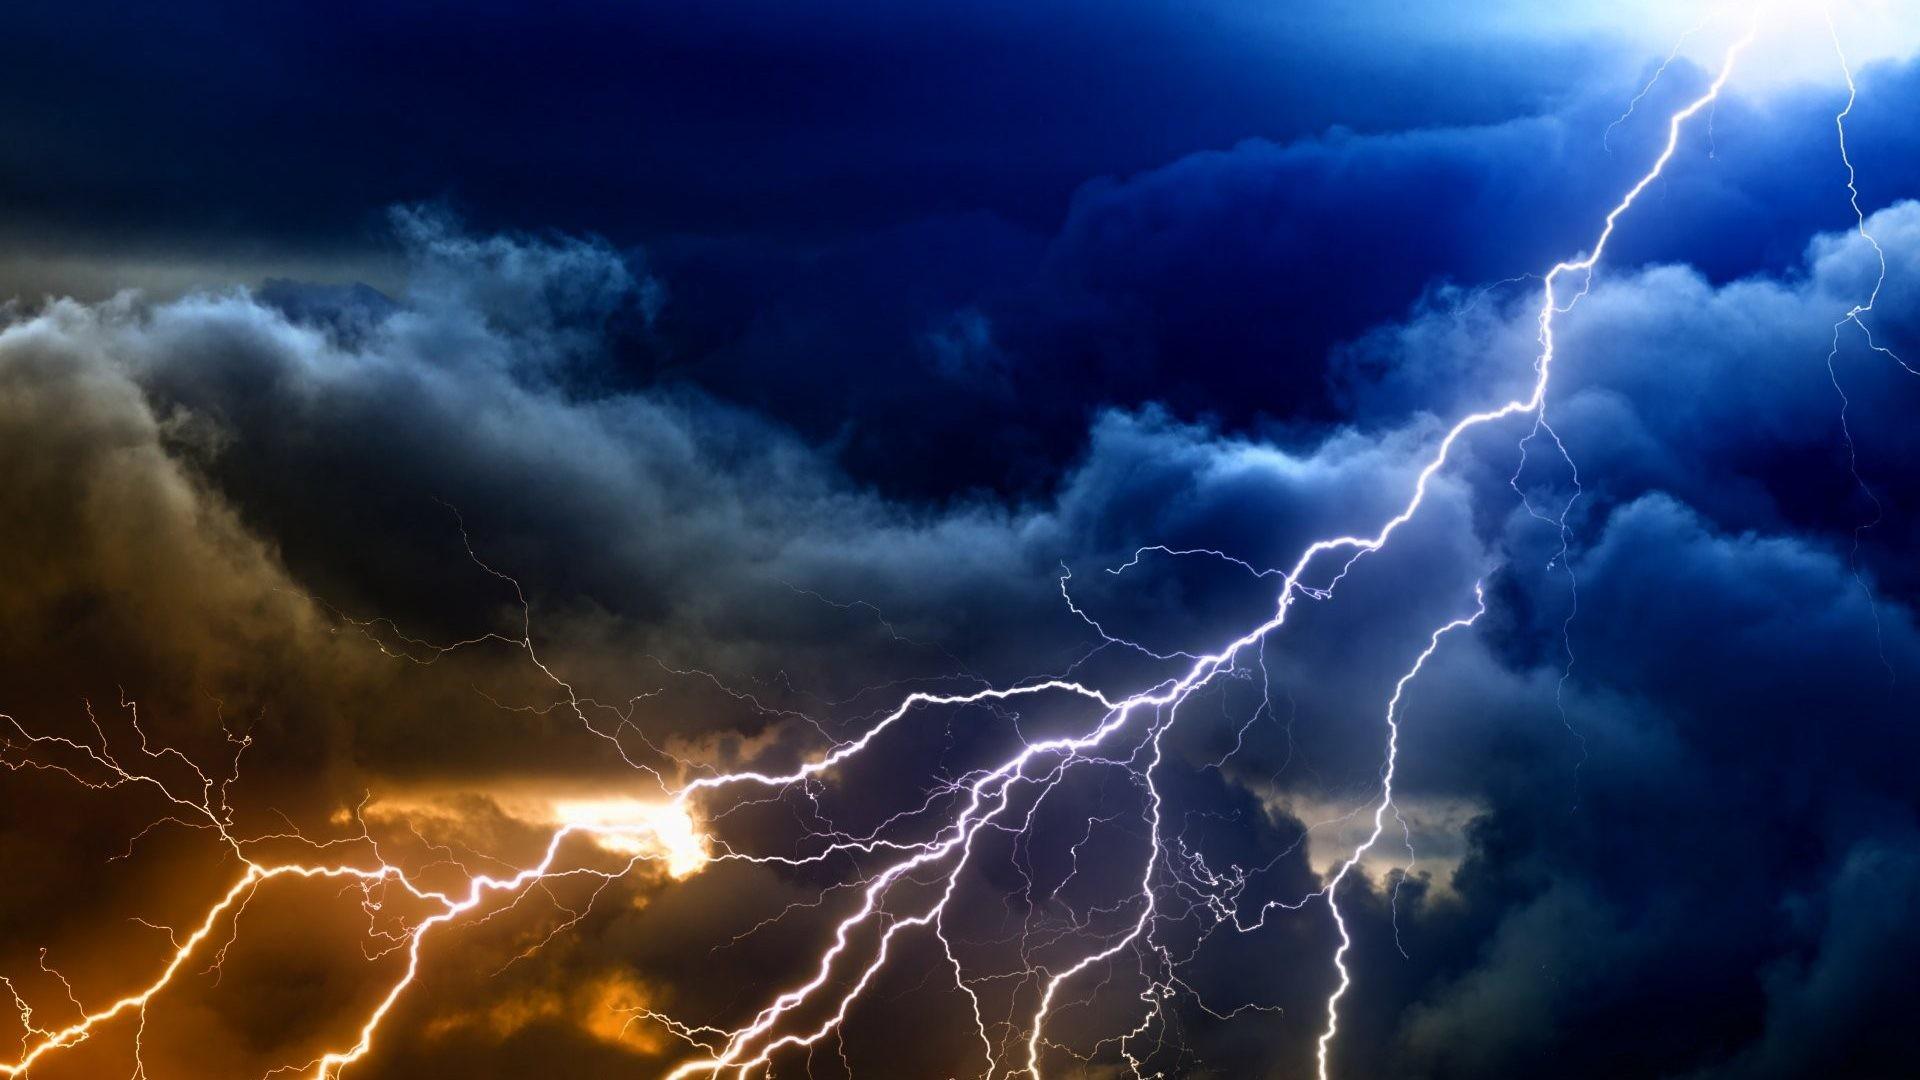 Res: 1920x1080, Lightning Strom